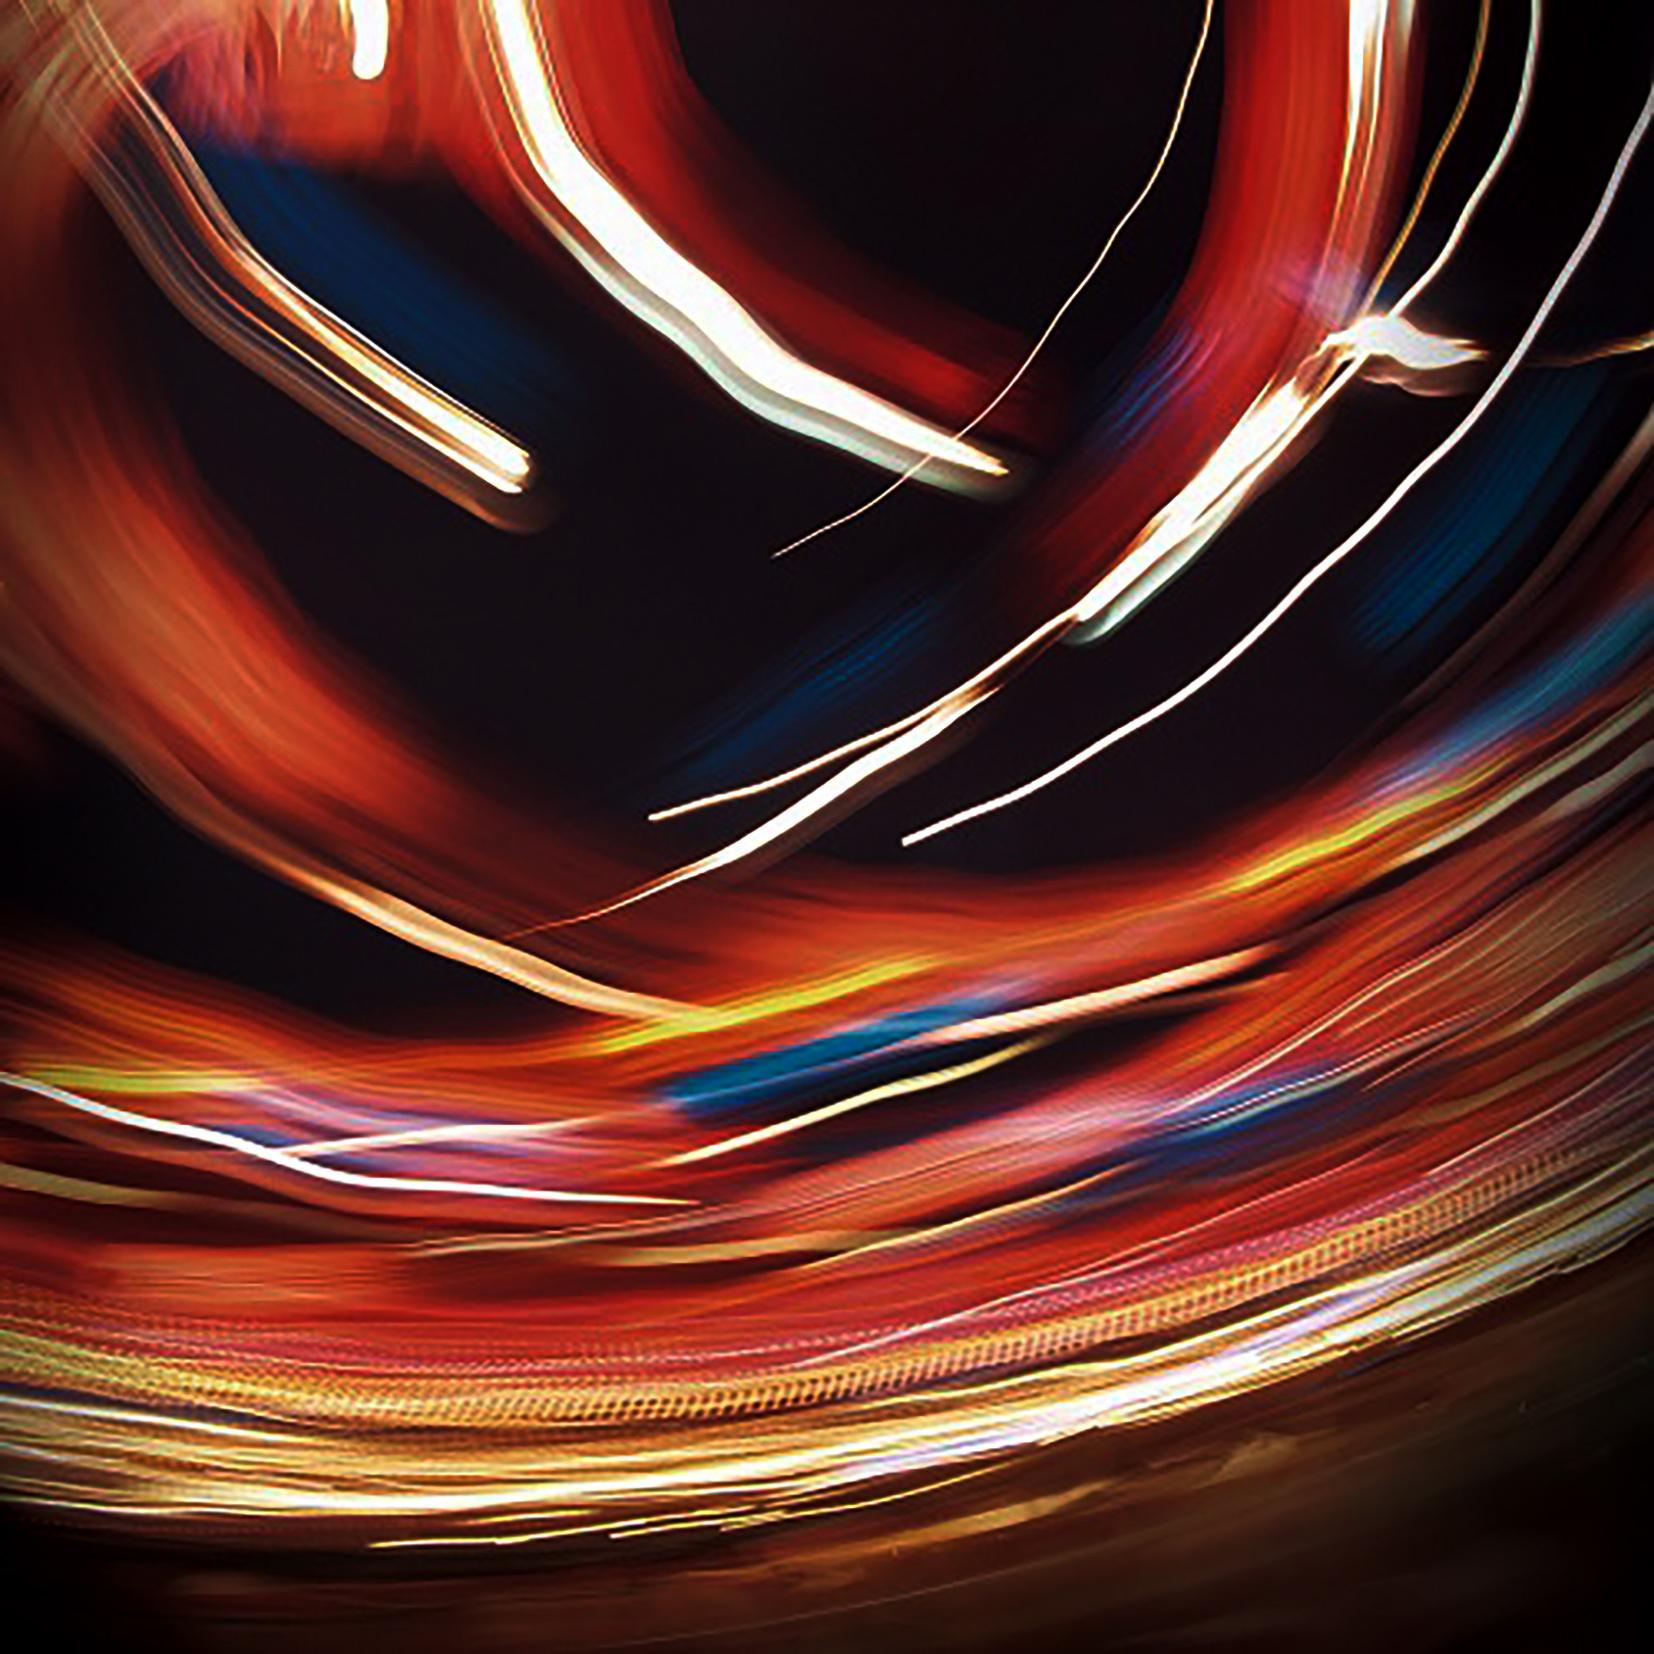 BUMP OF CHICKEN『firefly』高画質ジャケット画像